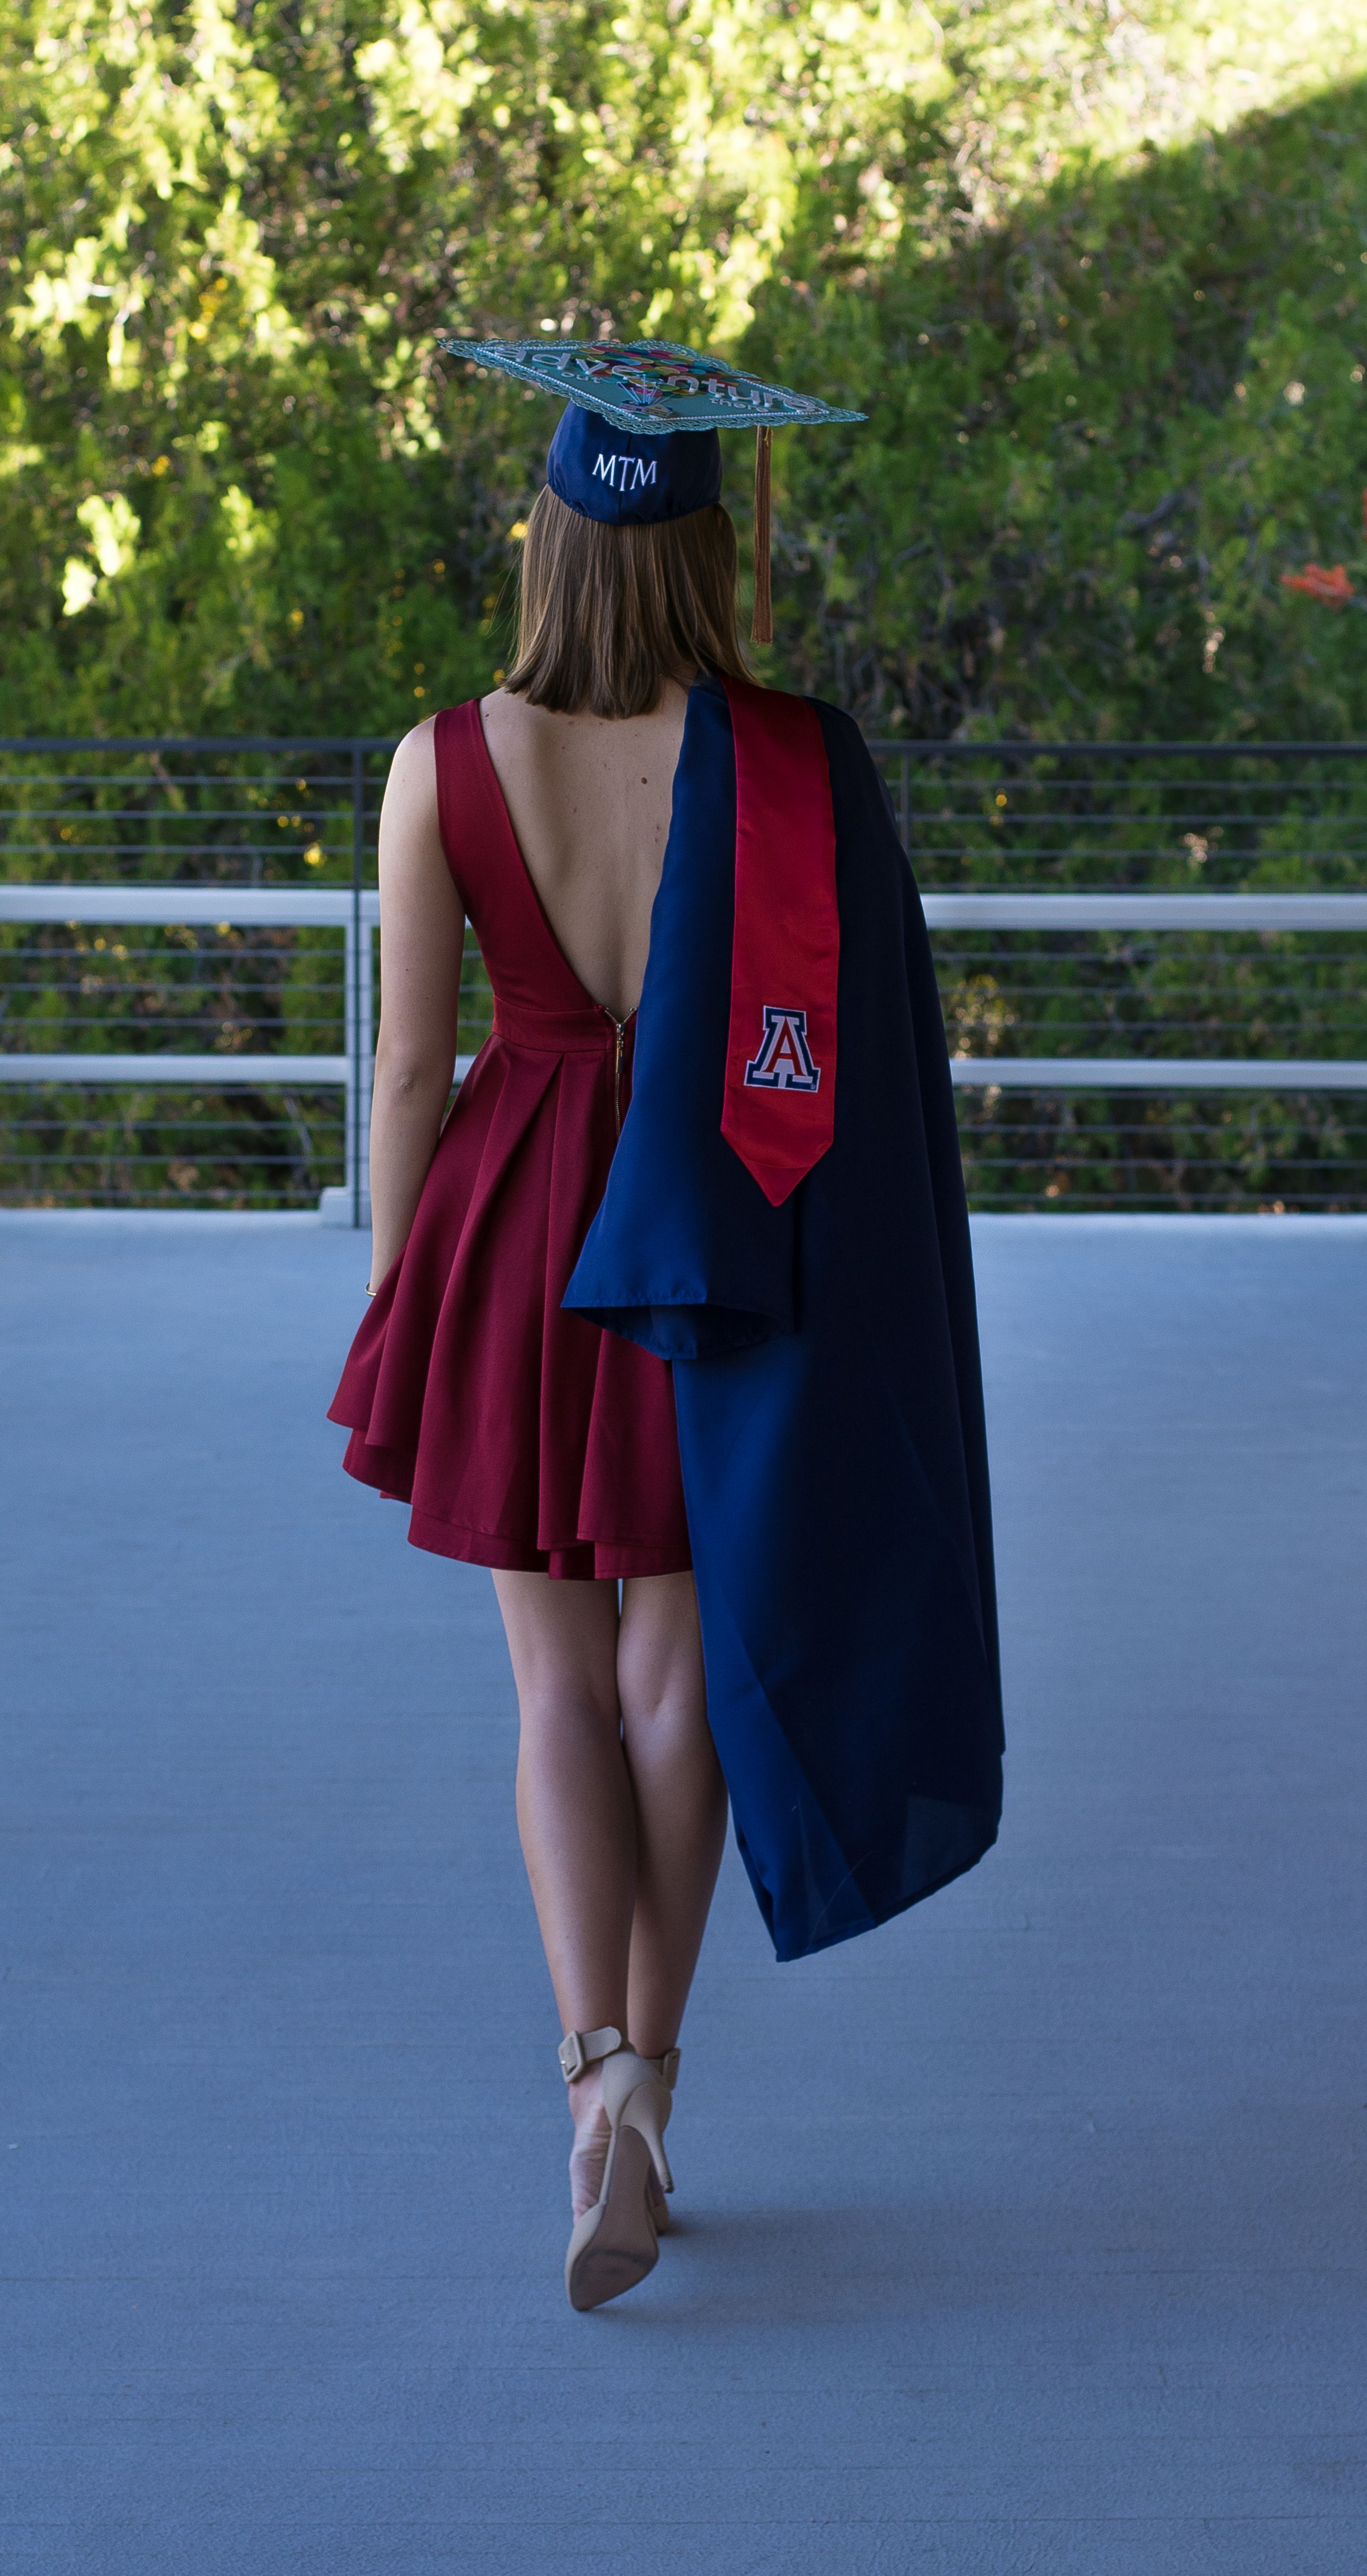 University of Arizona Graduation Photo. Photo Cred Sharon Thompson ...